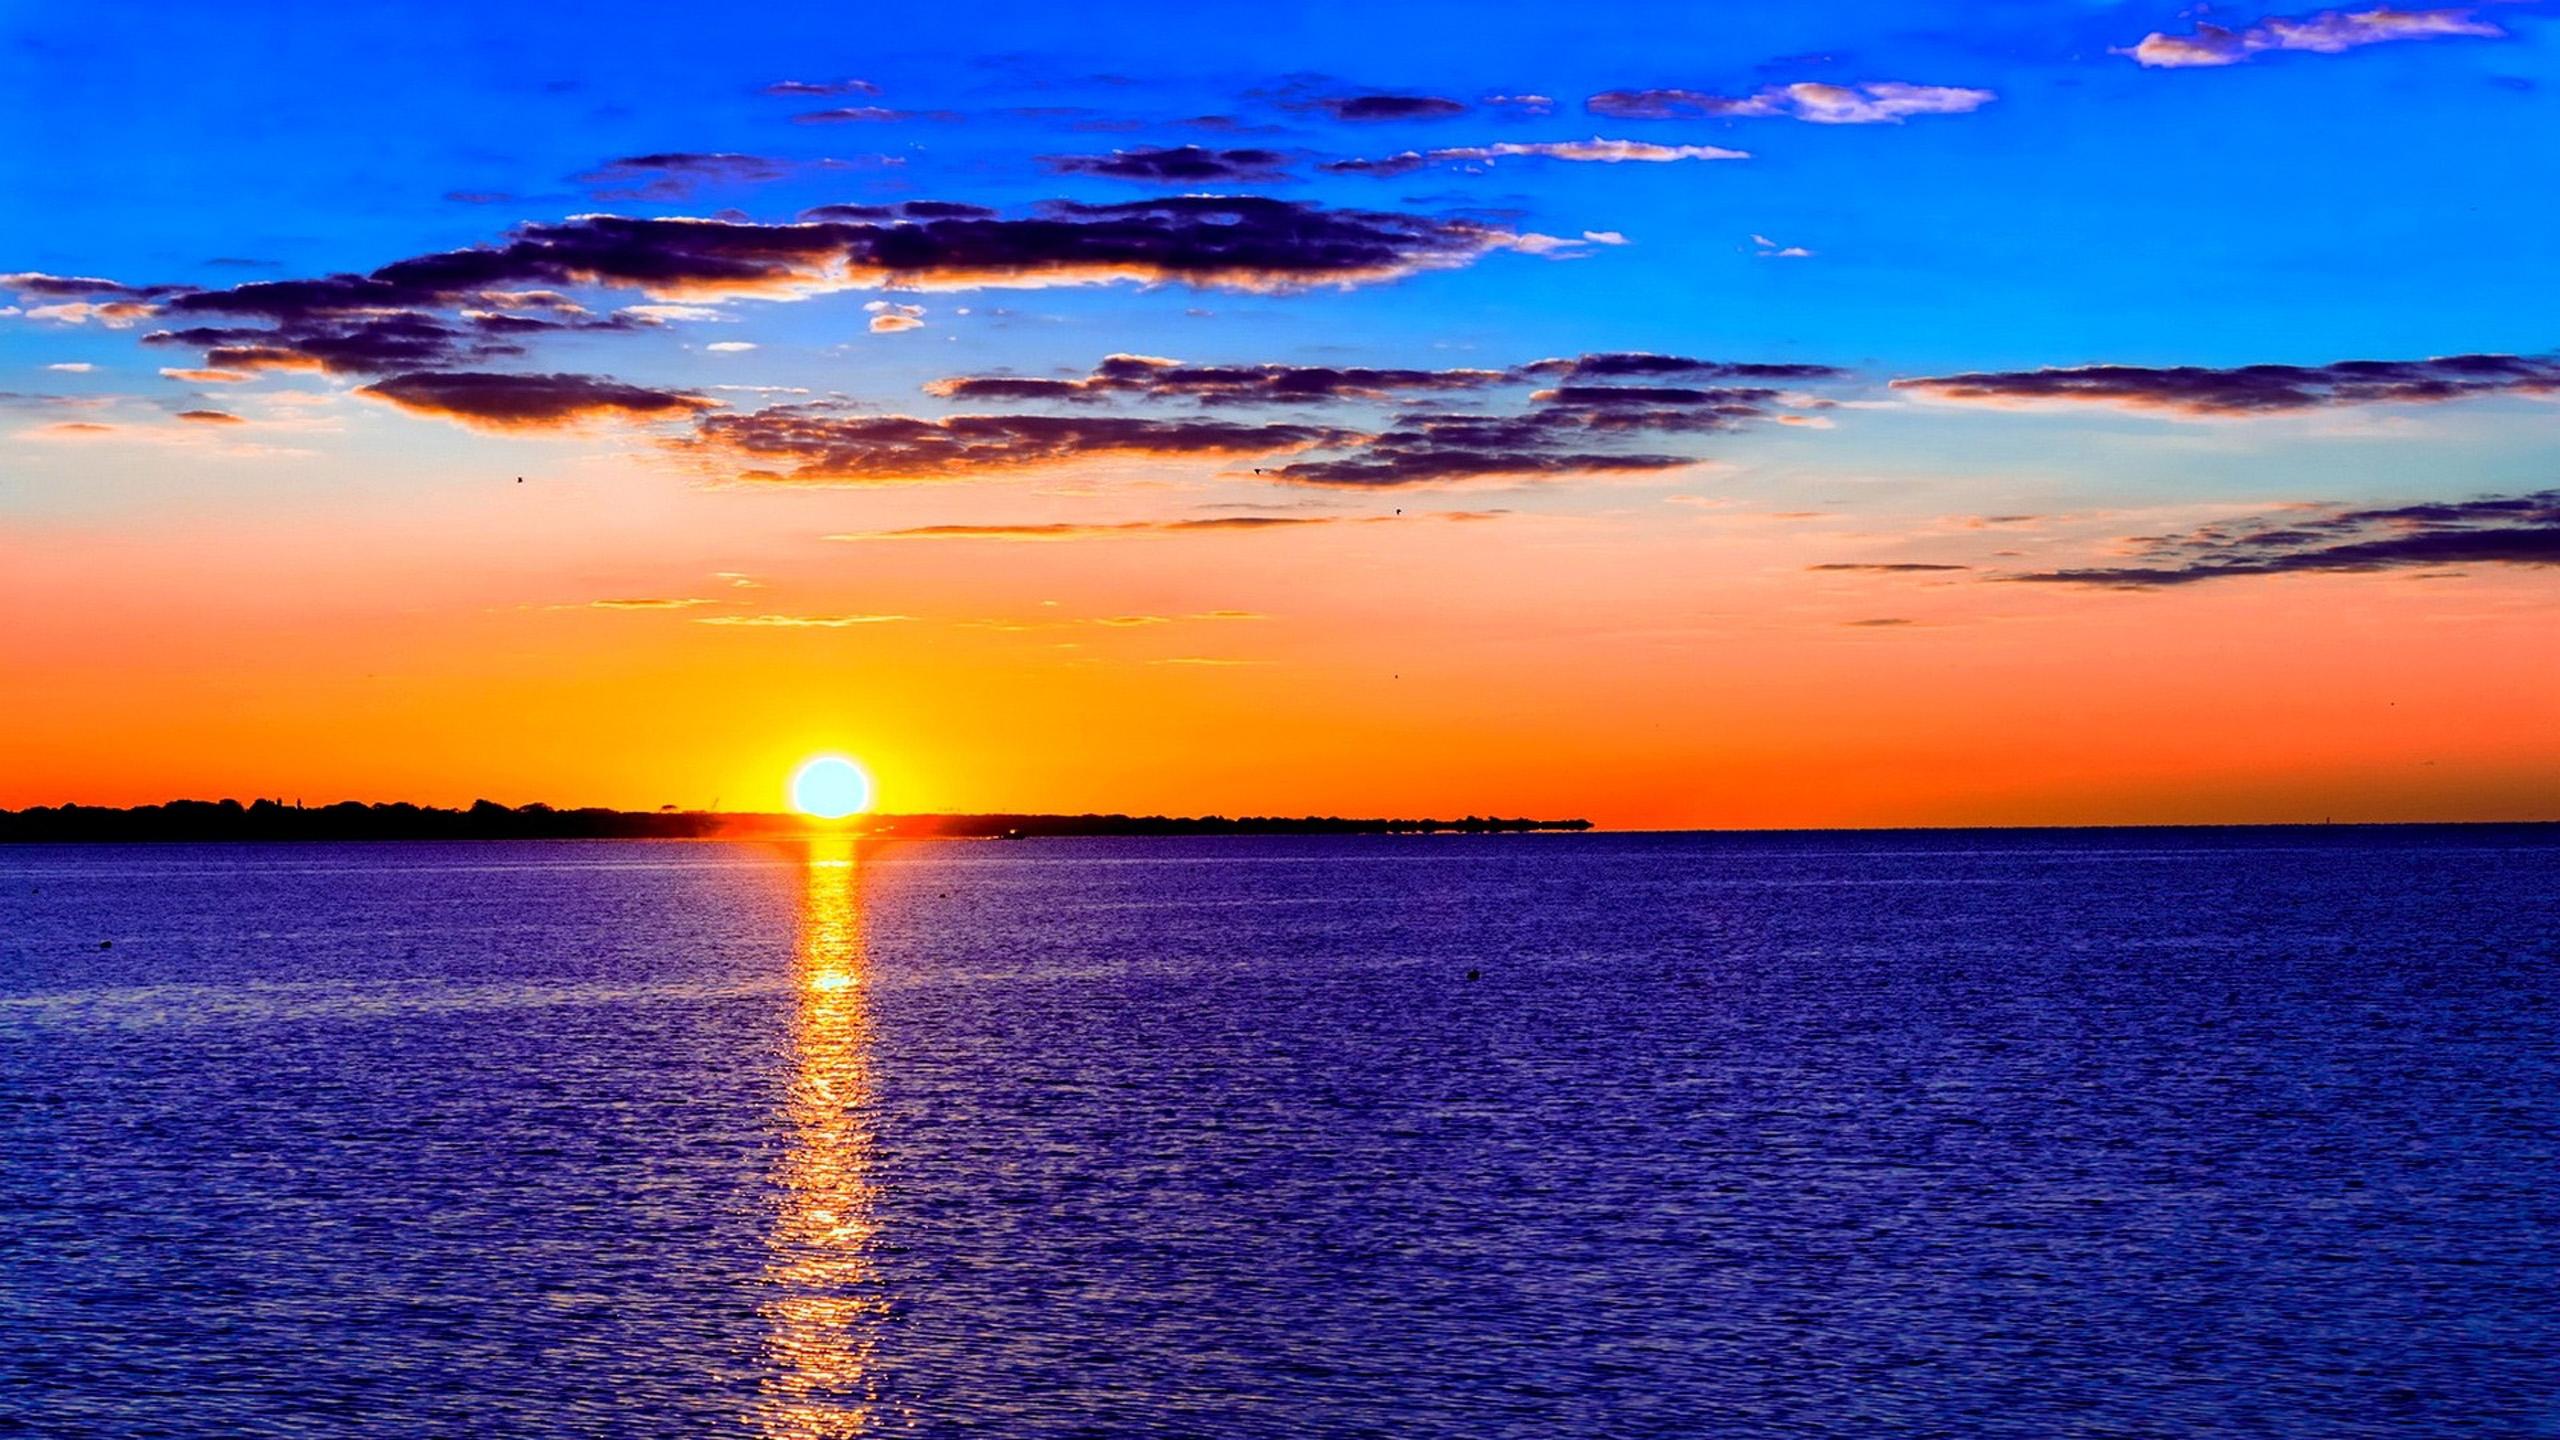 Ocean Sunset Images